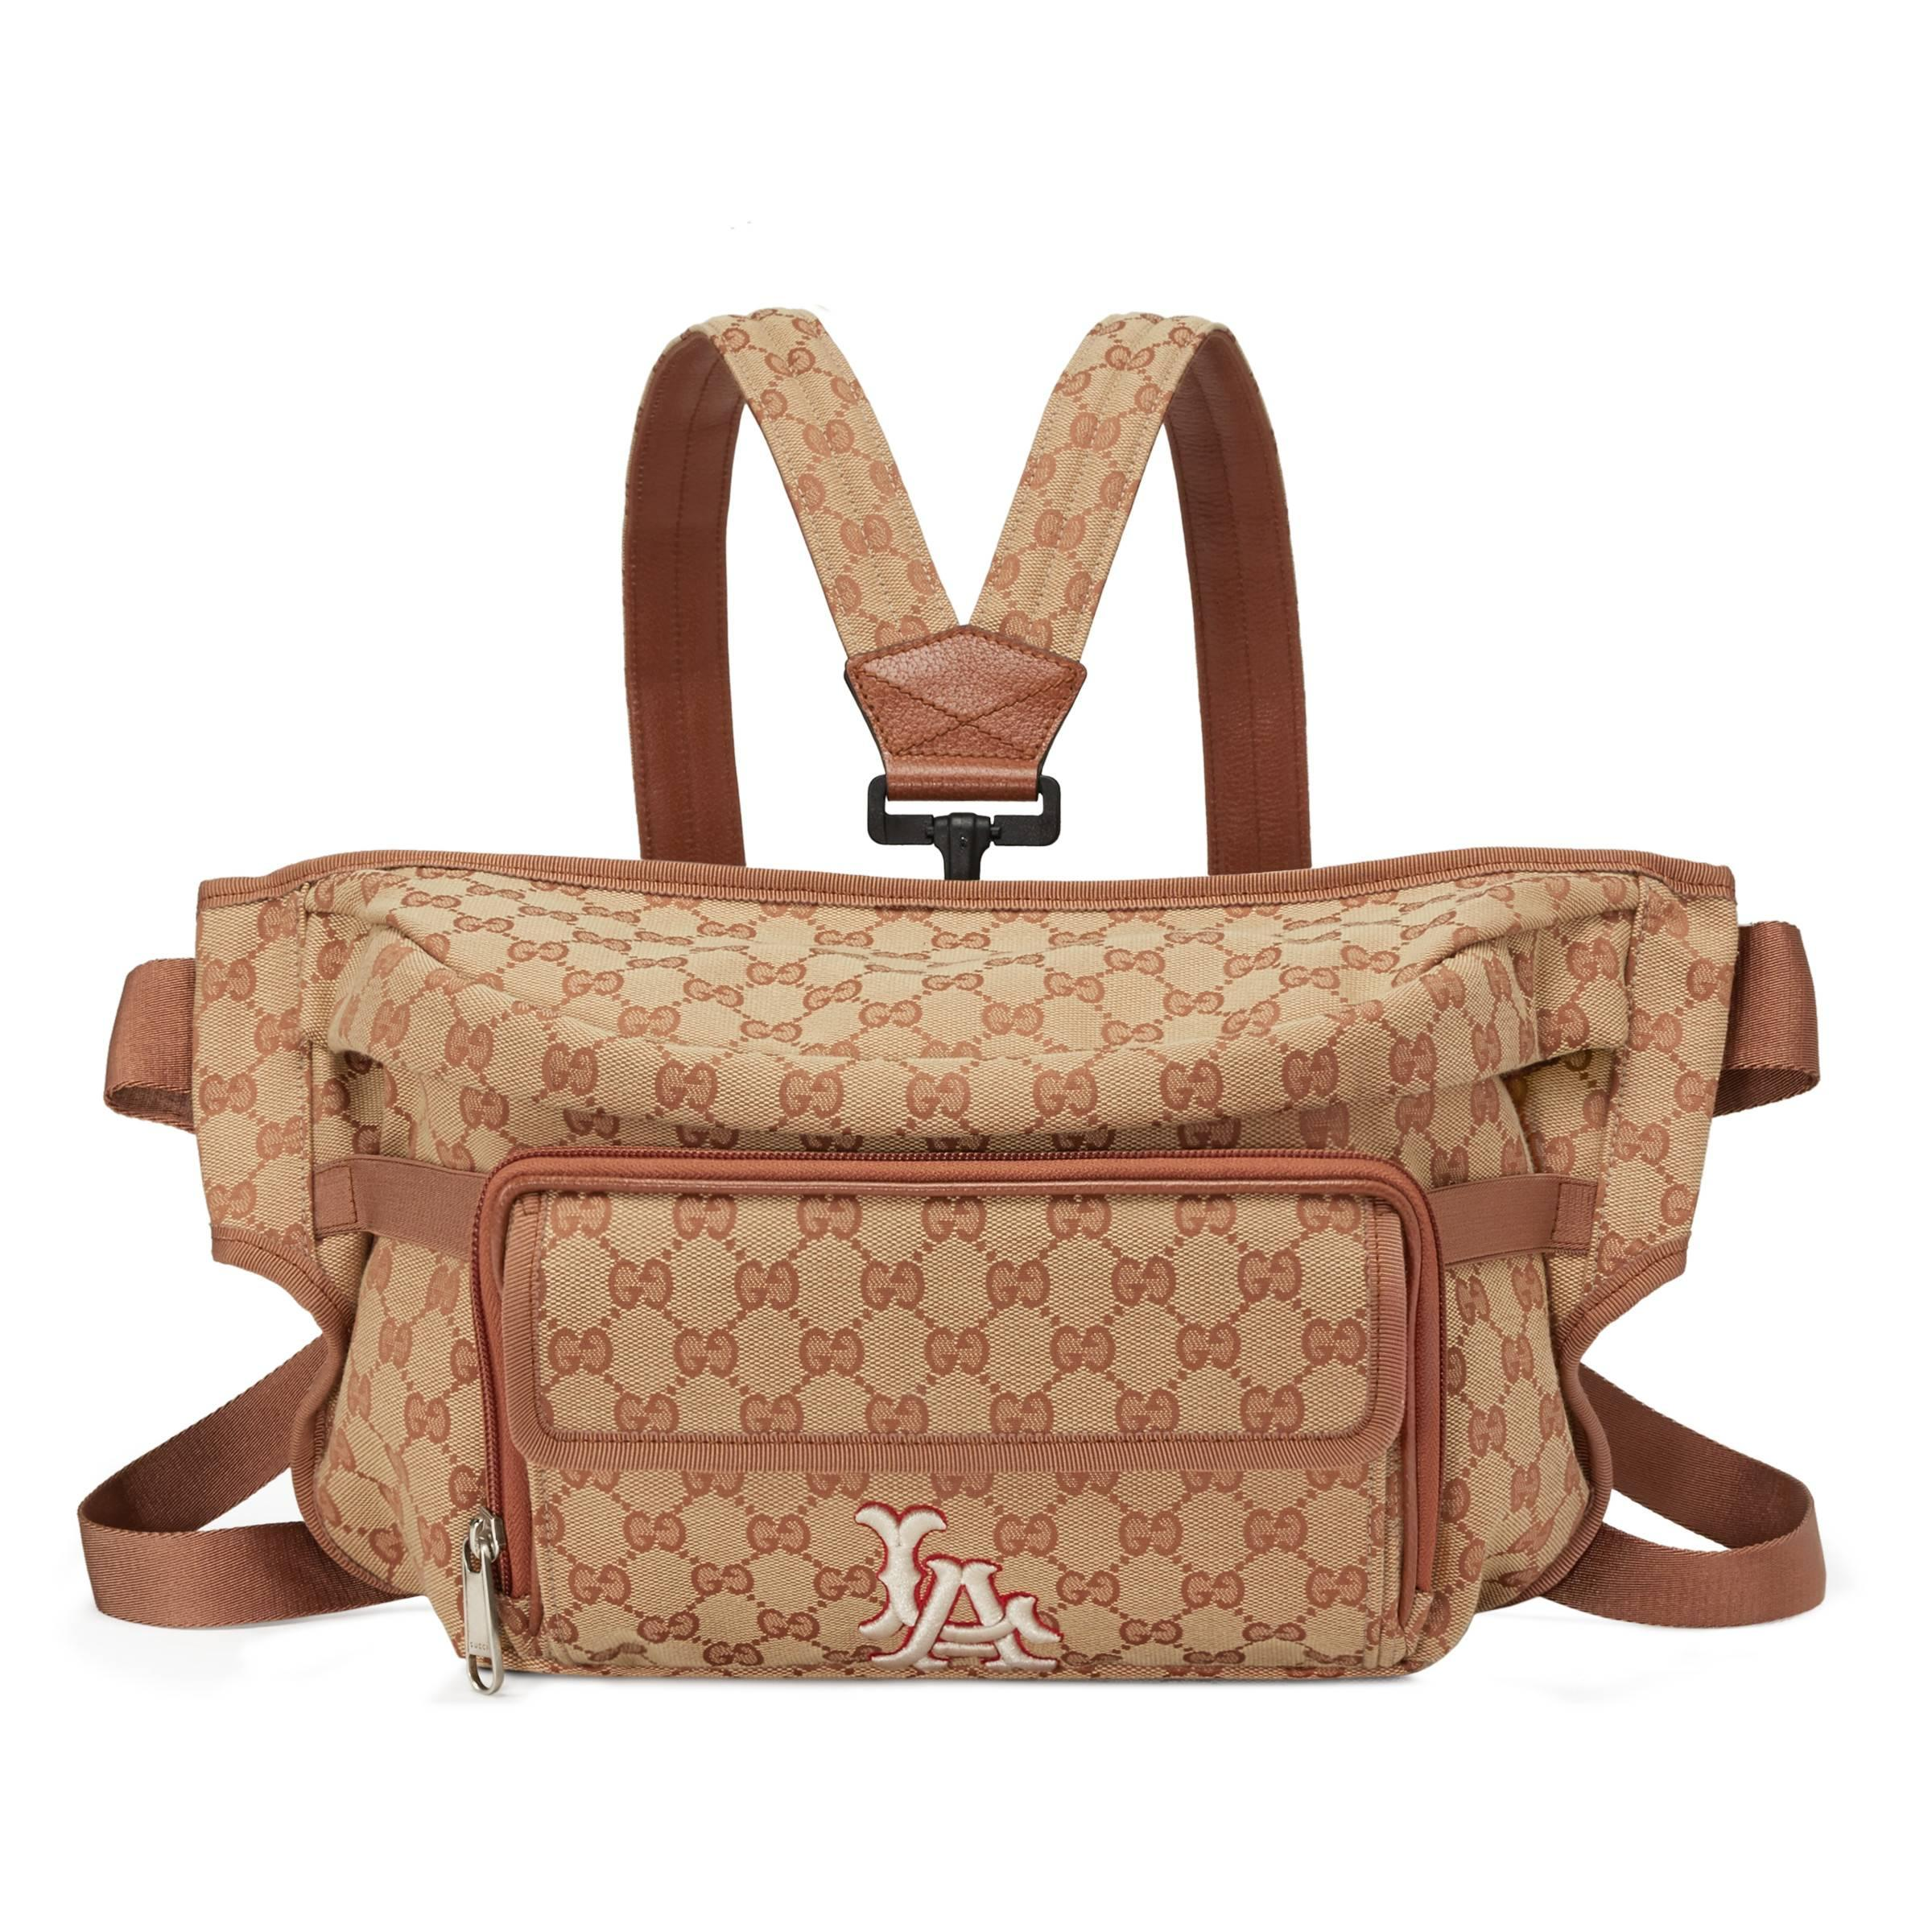 330e1fbab0e9c Lyst - Bolsa con Cinturón con Parche LA AngelsTM Gucci de hombre de ...